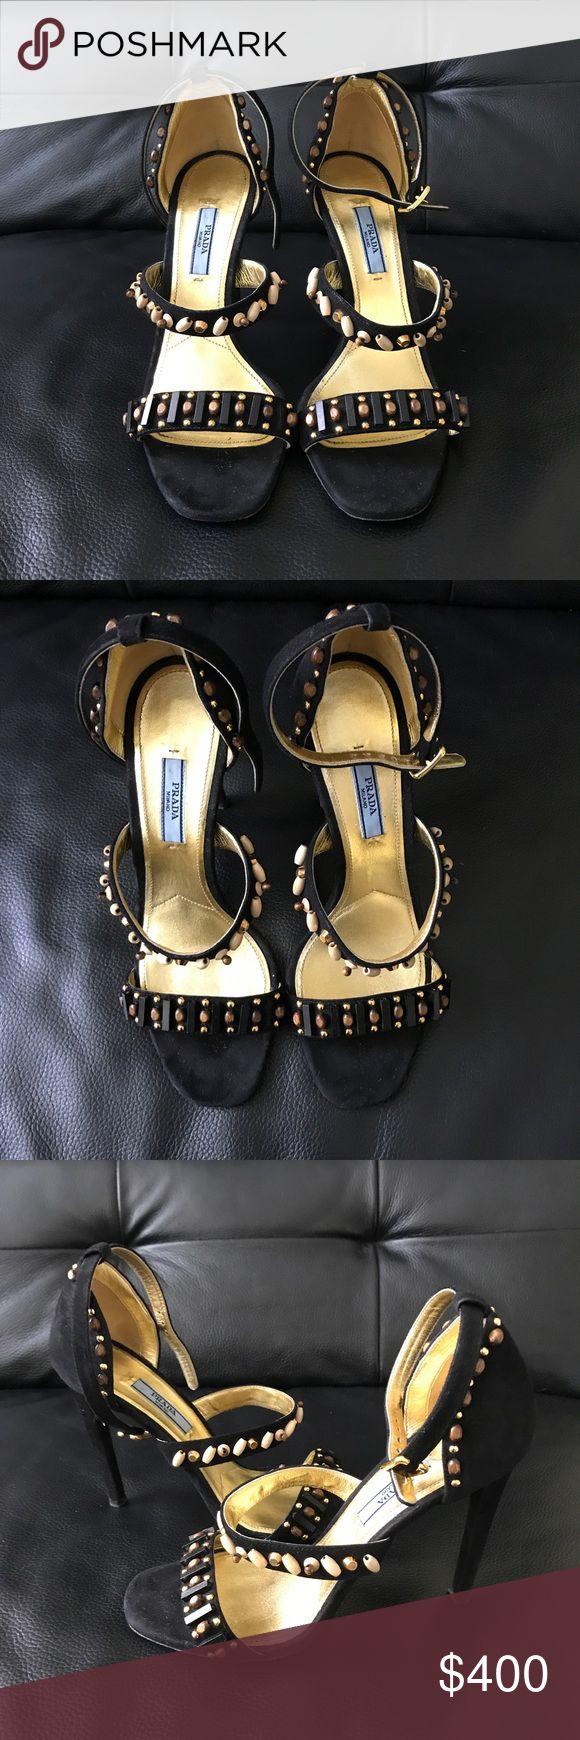 SALE!!  PRADA Beaded Suede Triple-Strap Sandals PRADA Suede Beaded strappy Sandals - perfect condition, no signs of wear. Prada Shoes Sandals